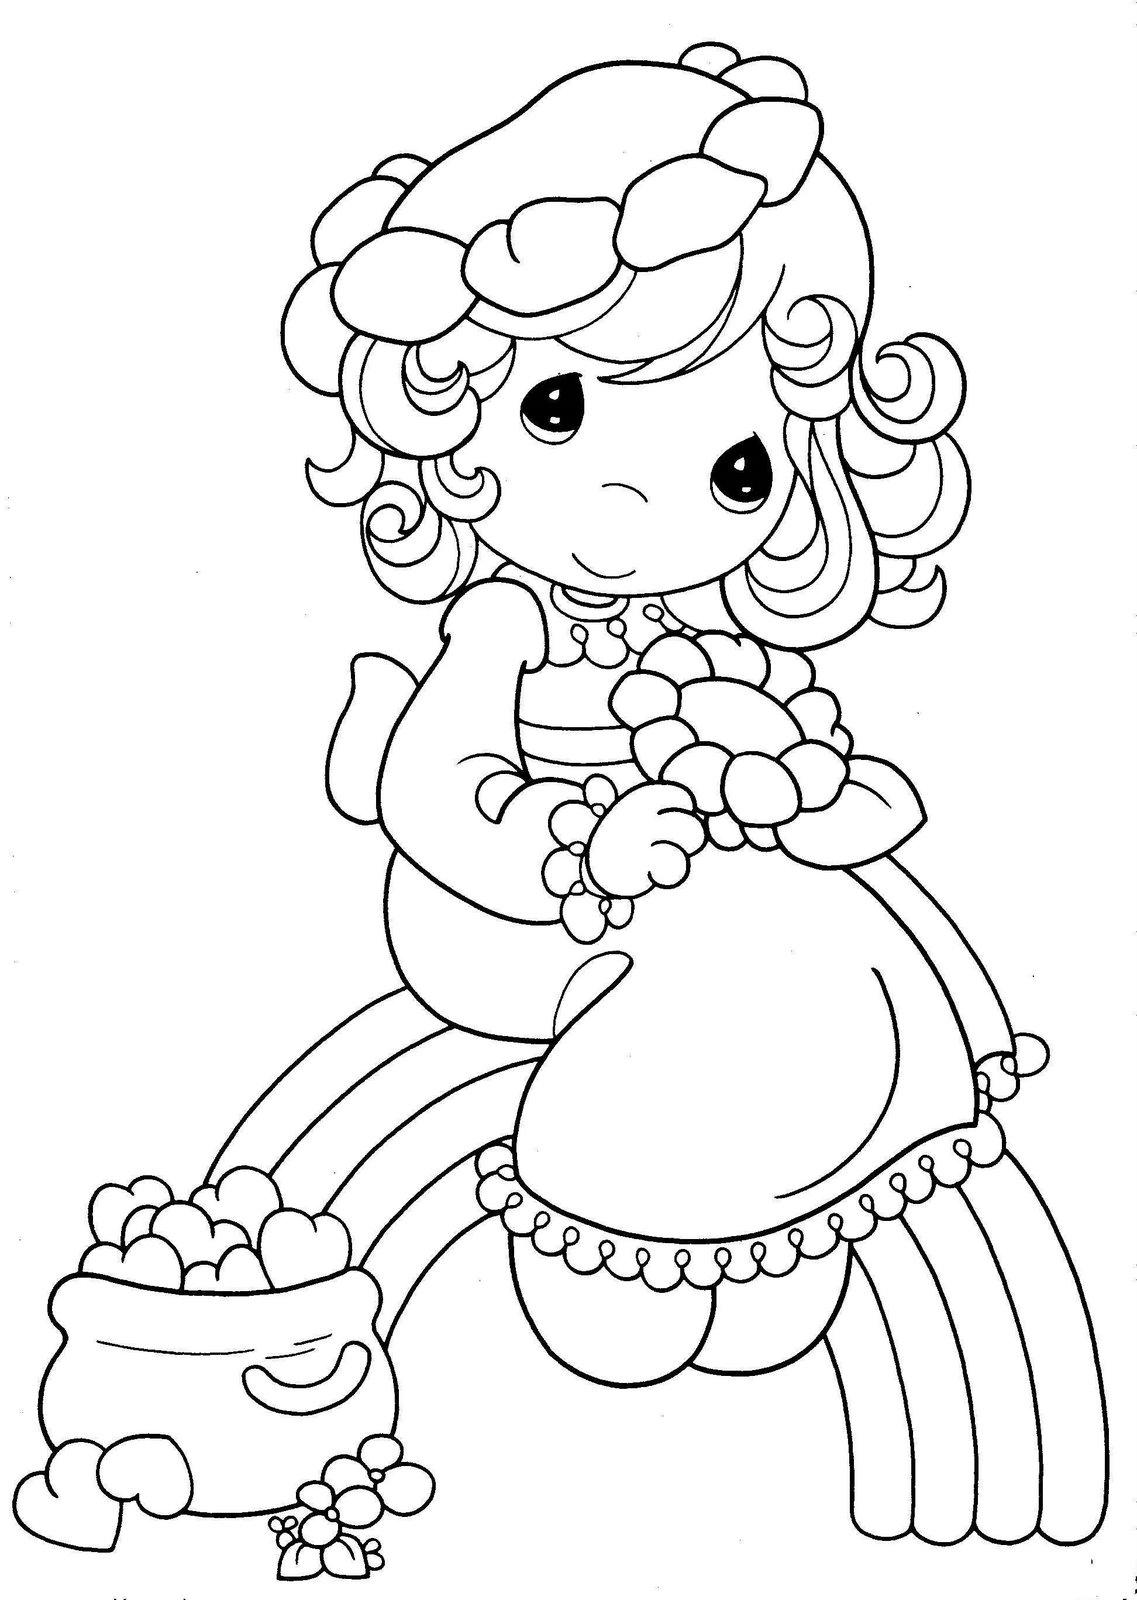 Famoso Lindas Páginas Para Colorear Para Niñas Elaboración - Dibujos ...